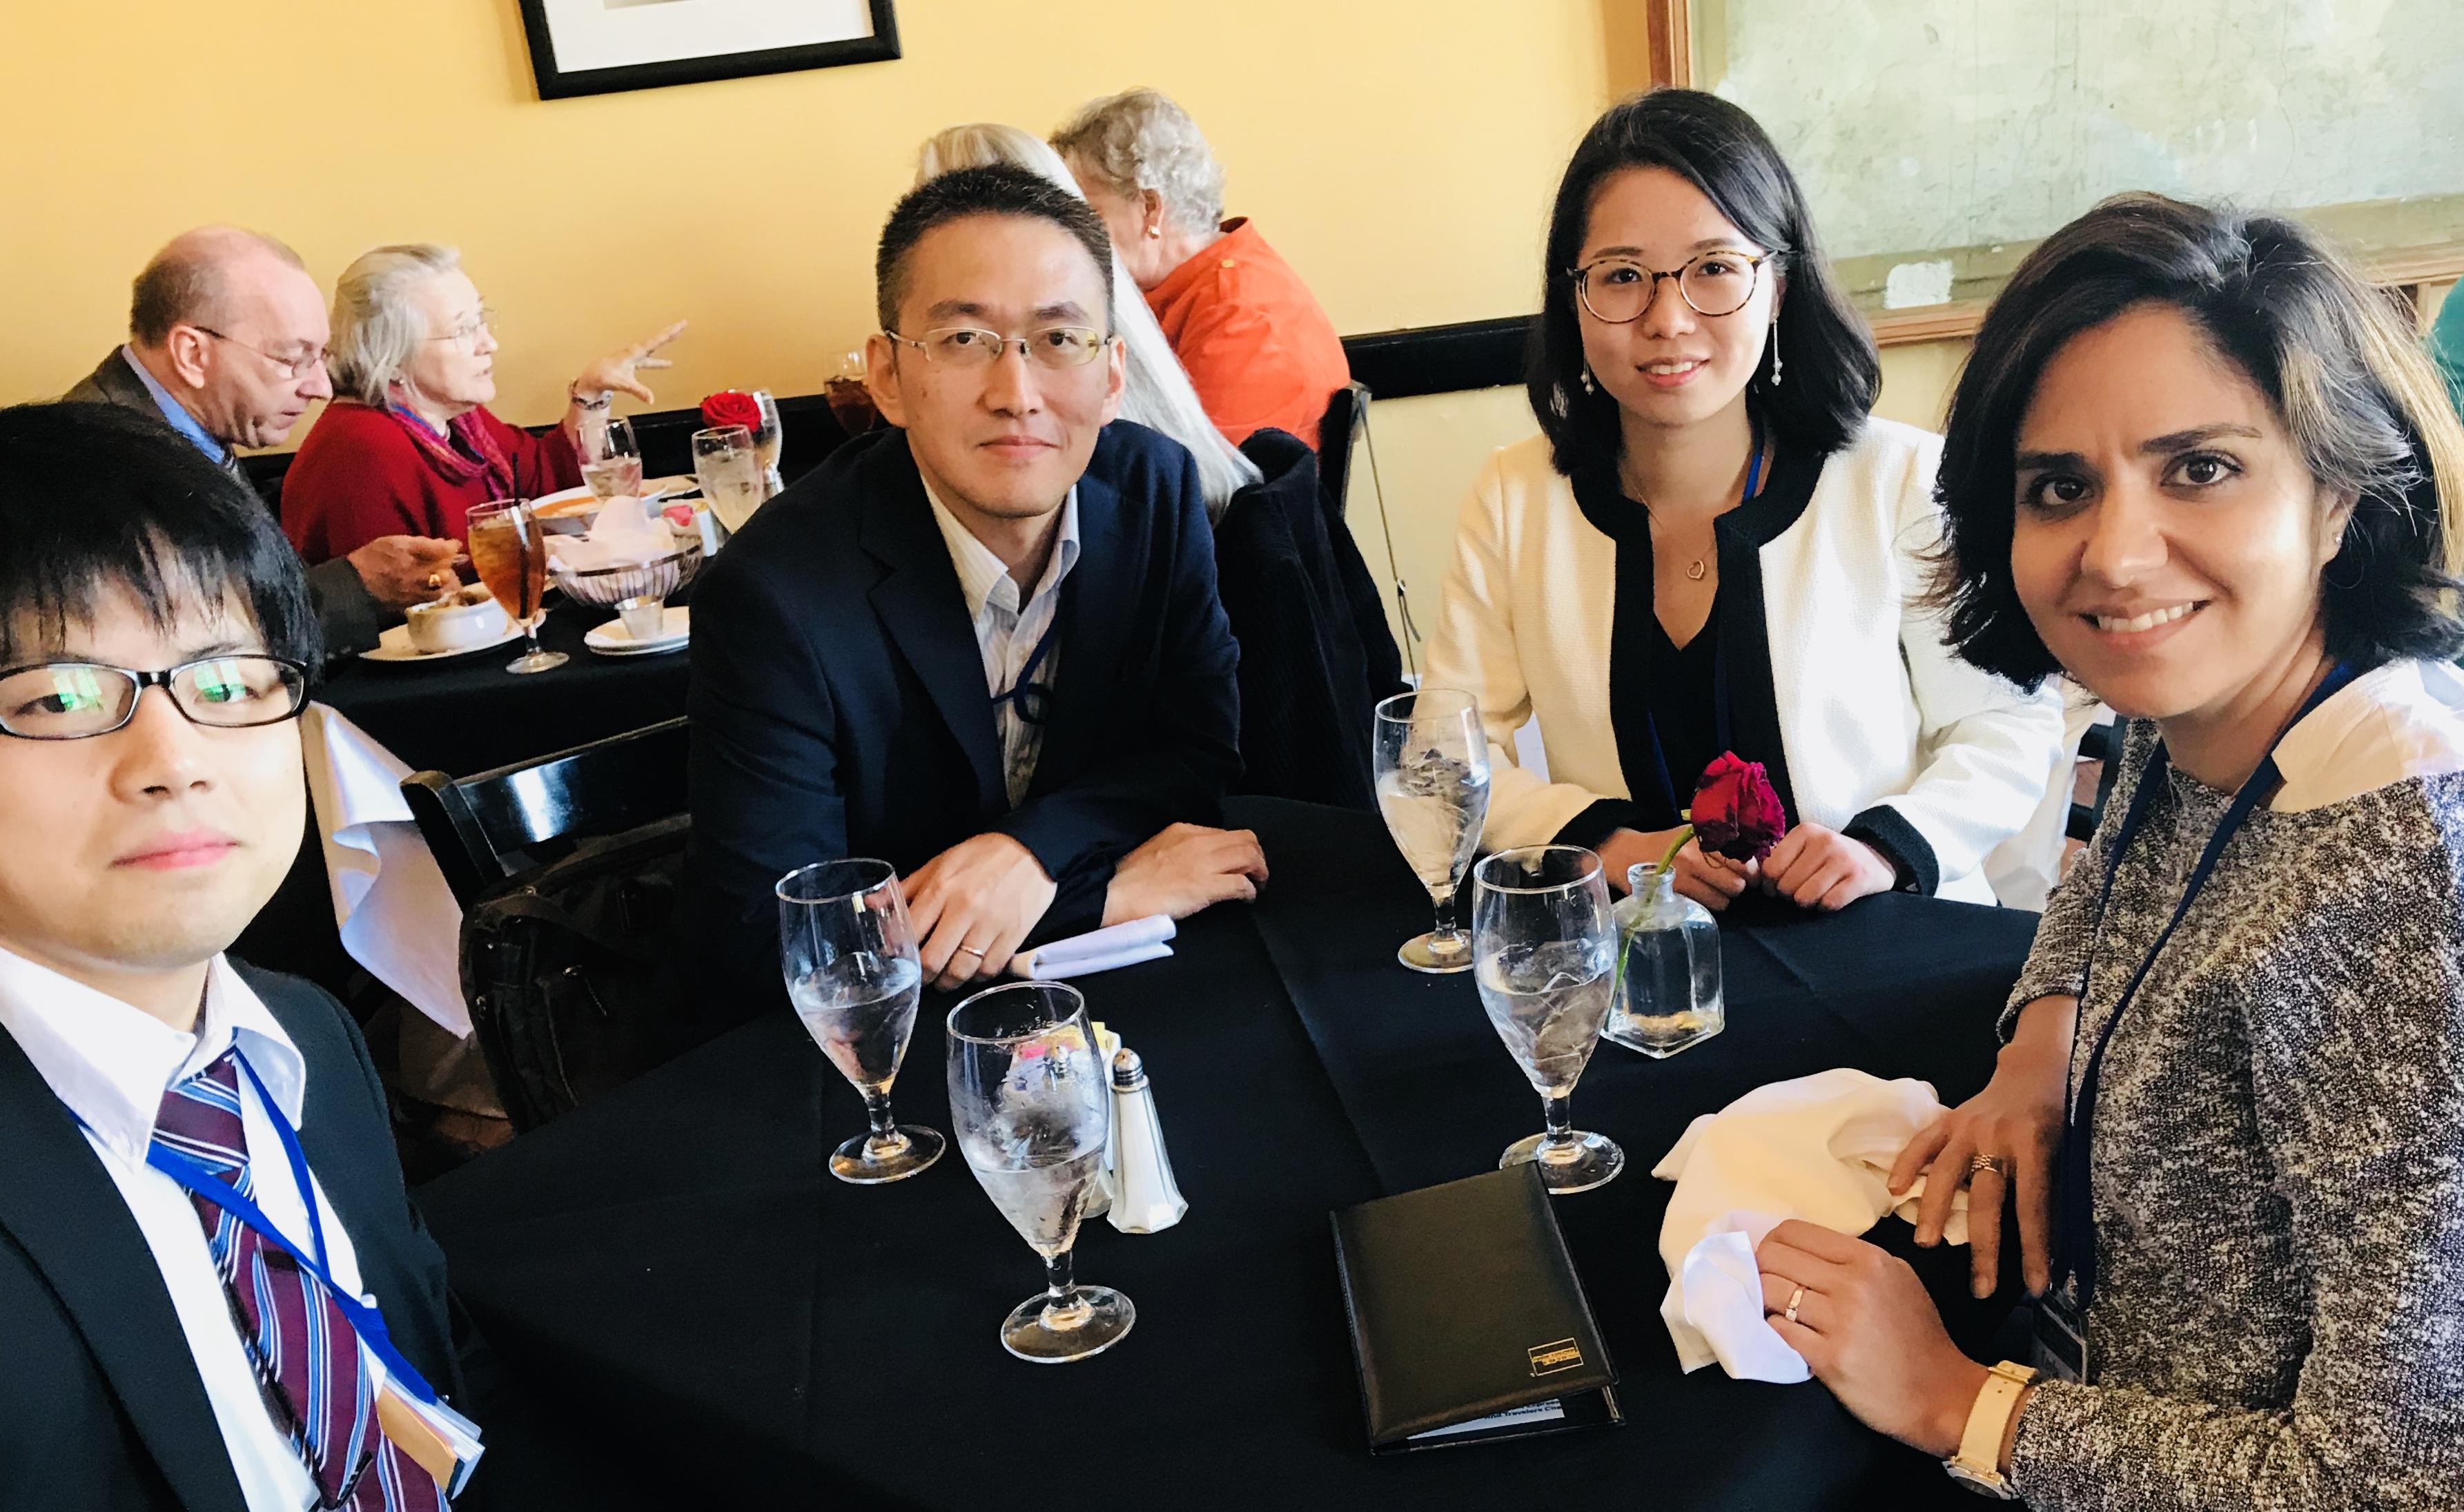 Meeting collaborators at MicroTAS meeting